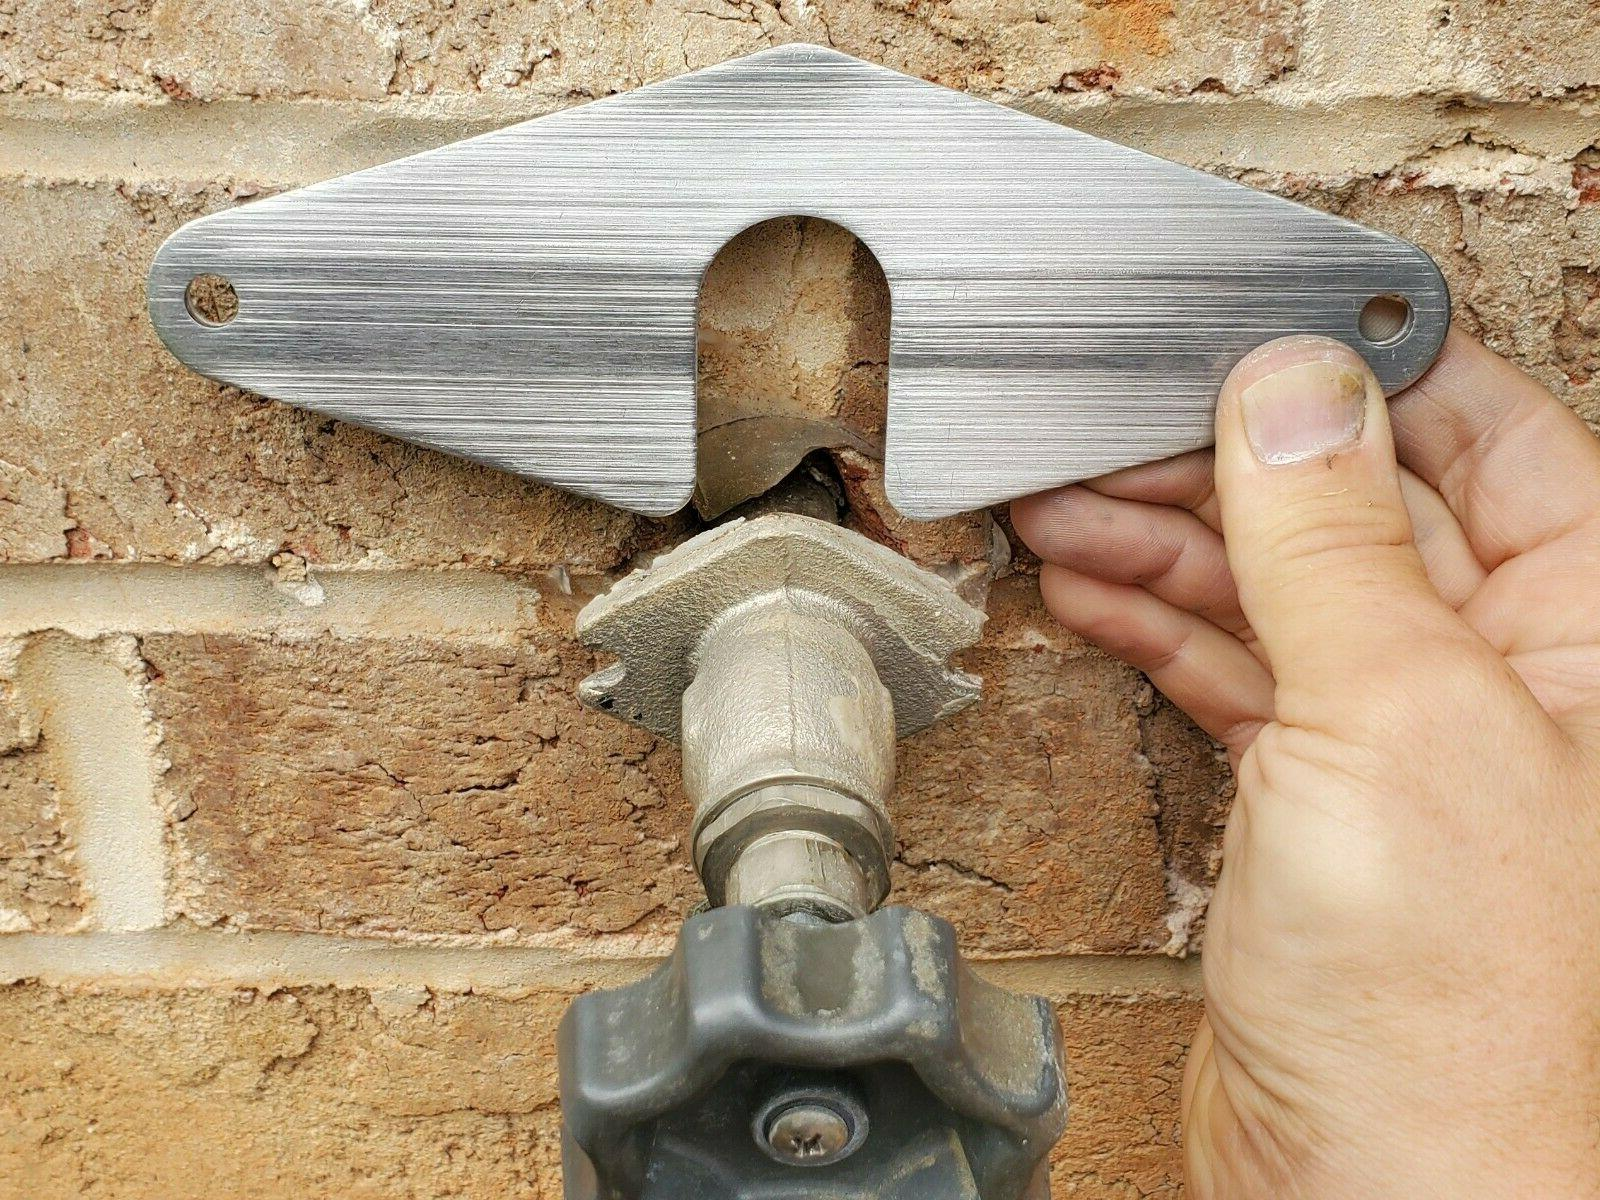 sillcock spigot loose repair plate garden faucet